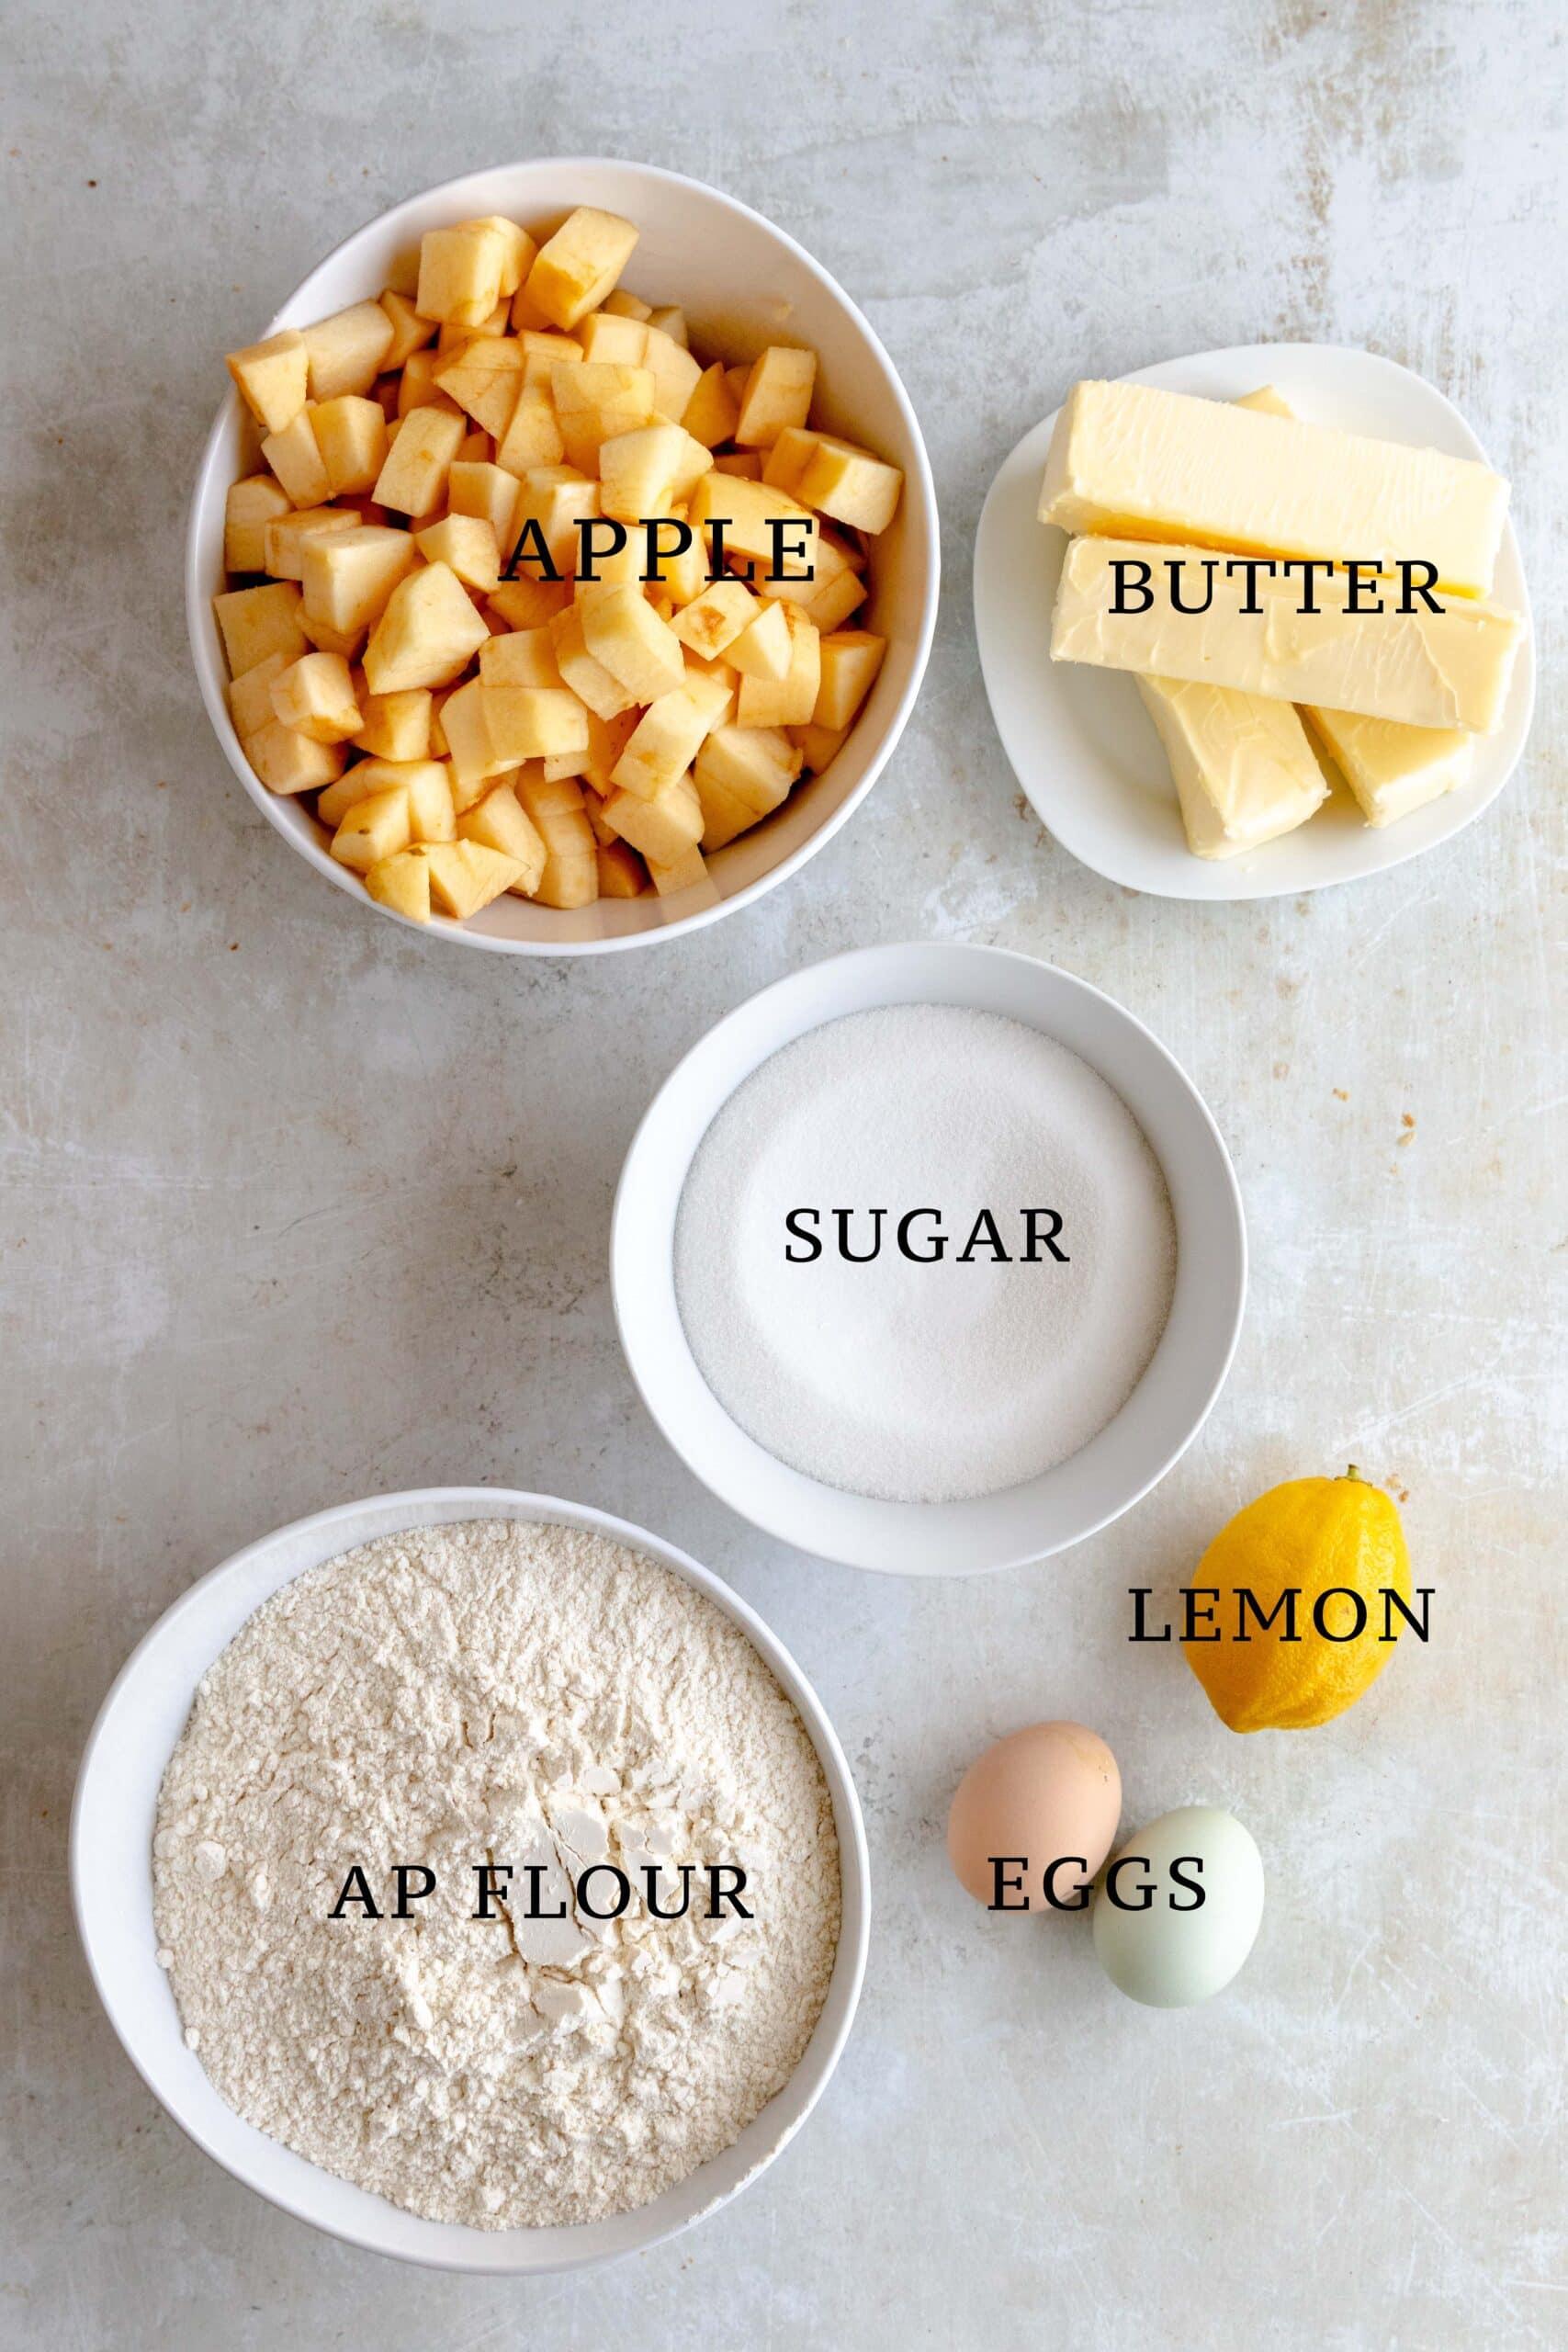 Ingredients needed for Apple Streusel Bars